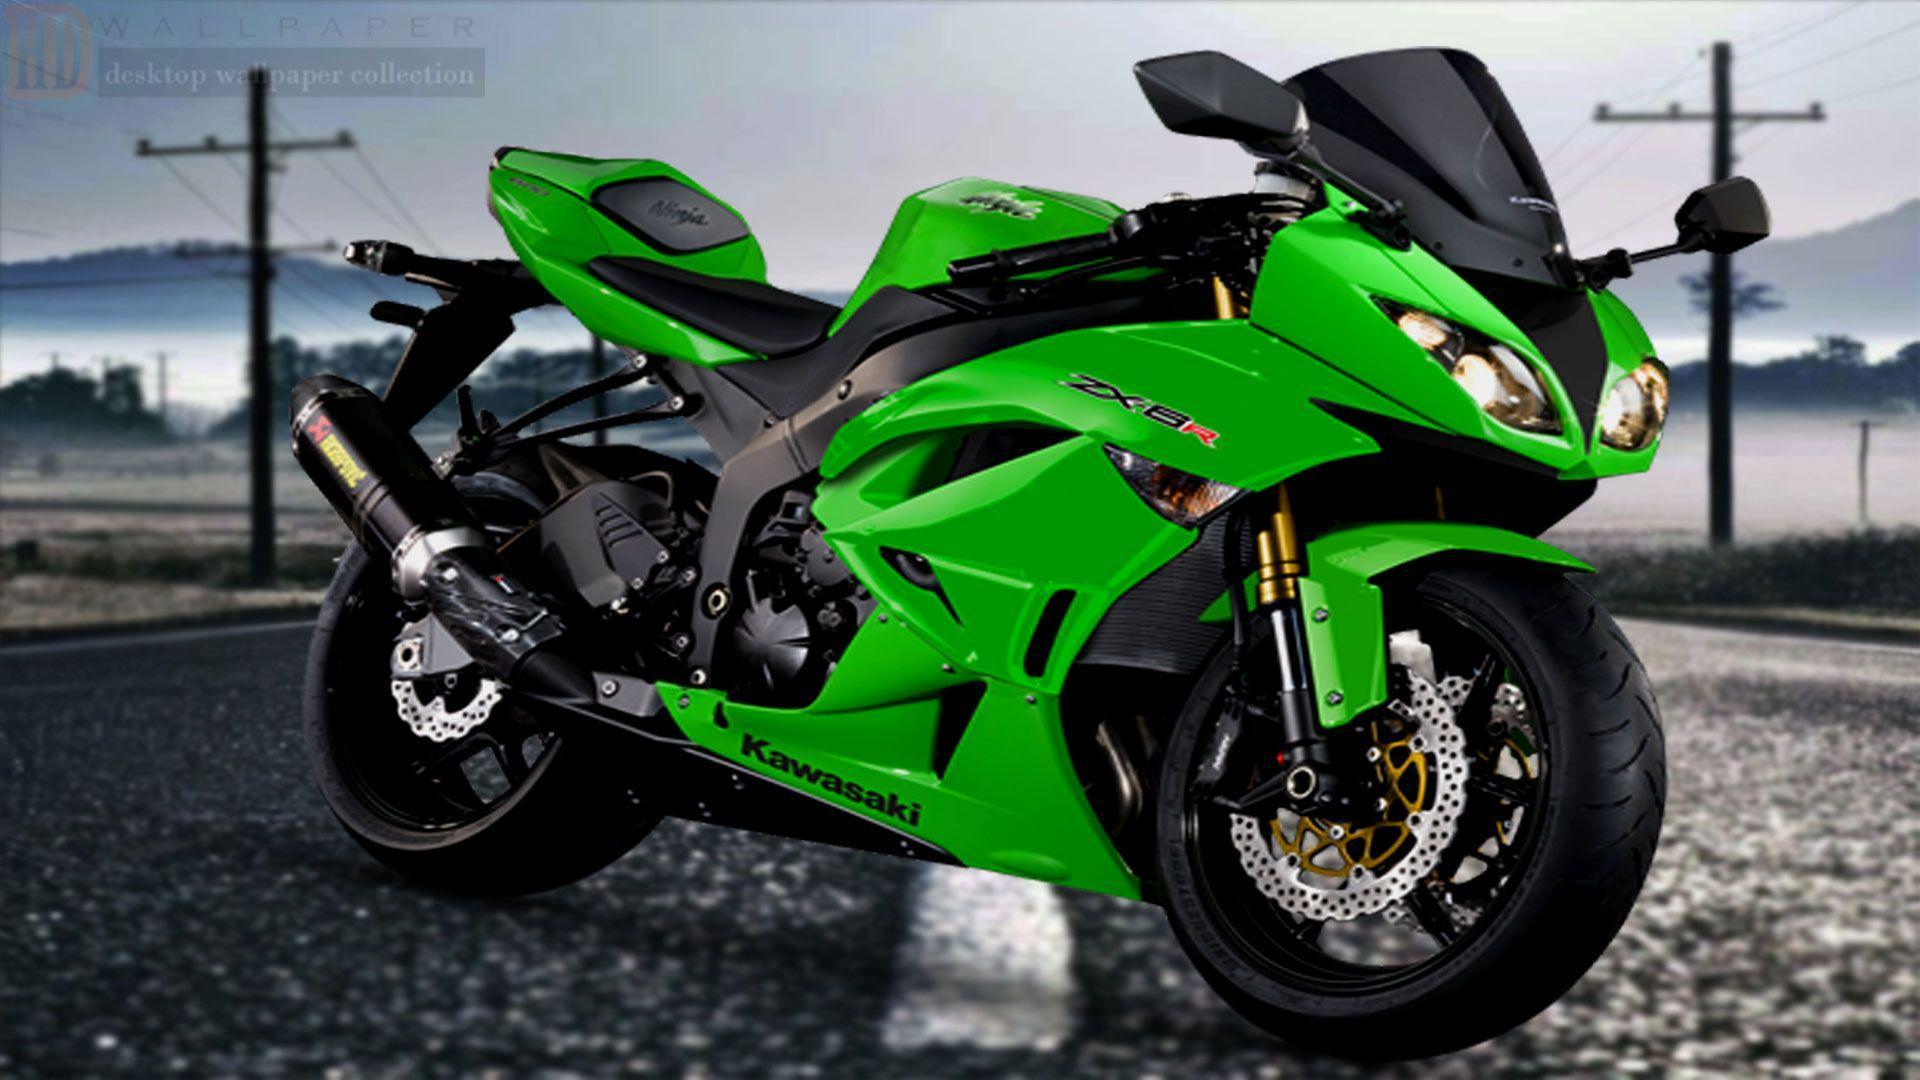 1600x1200 Desktop Ninja Bike Pics Download